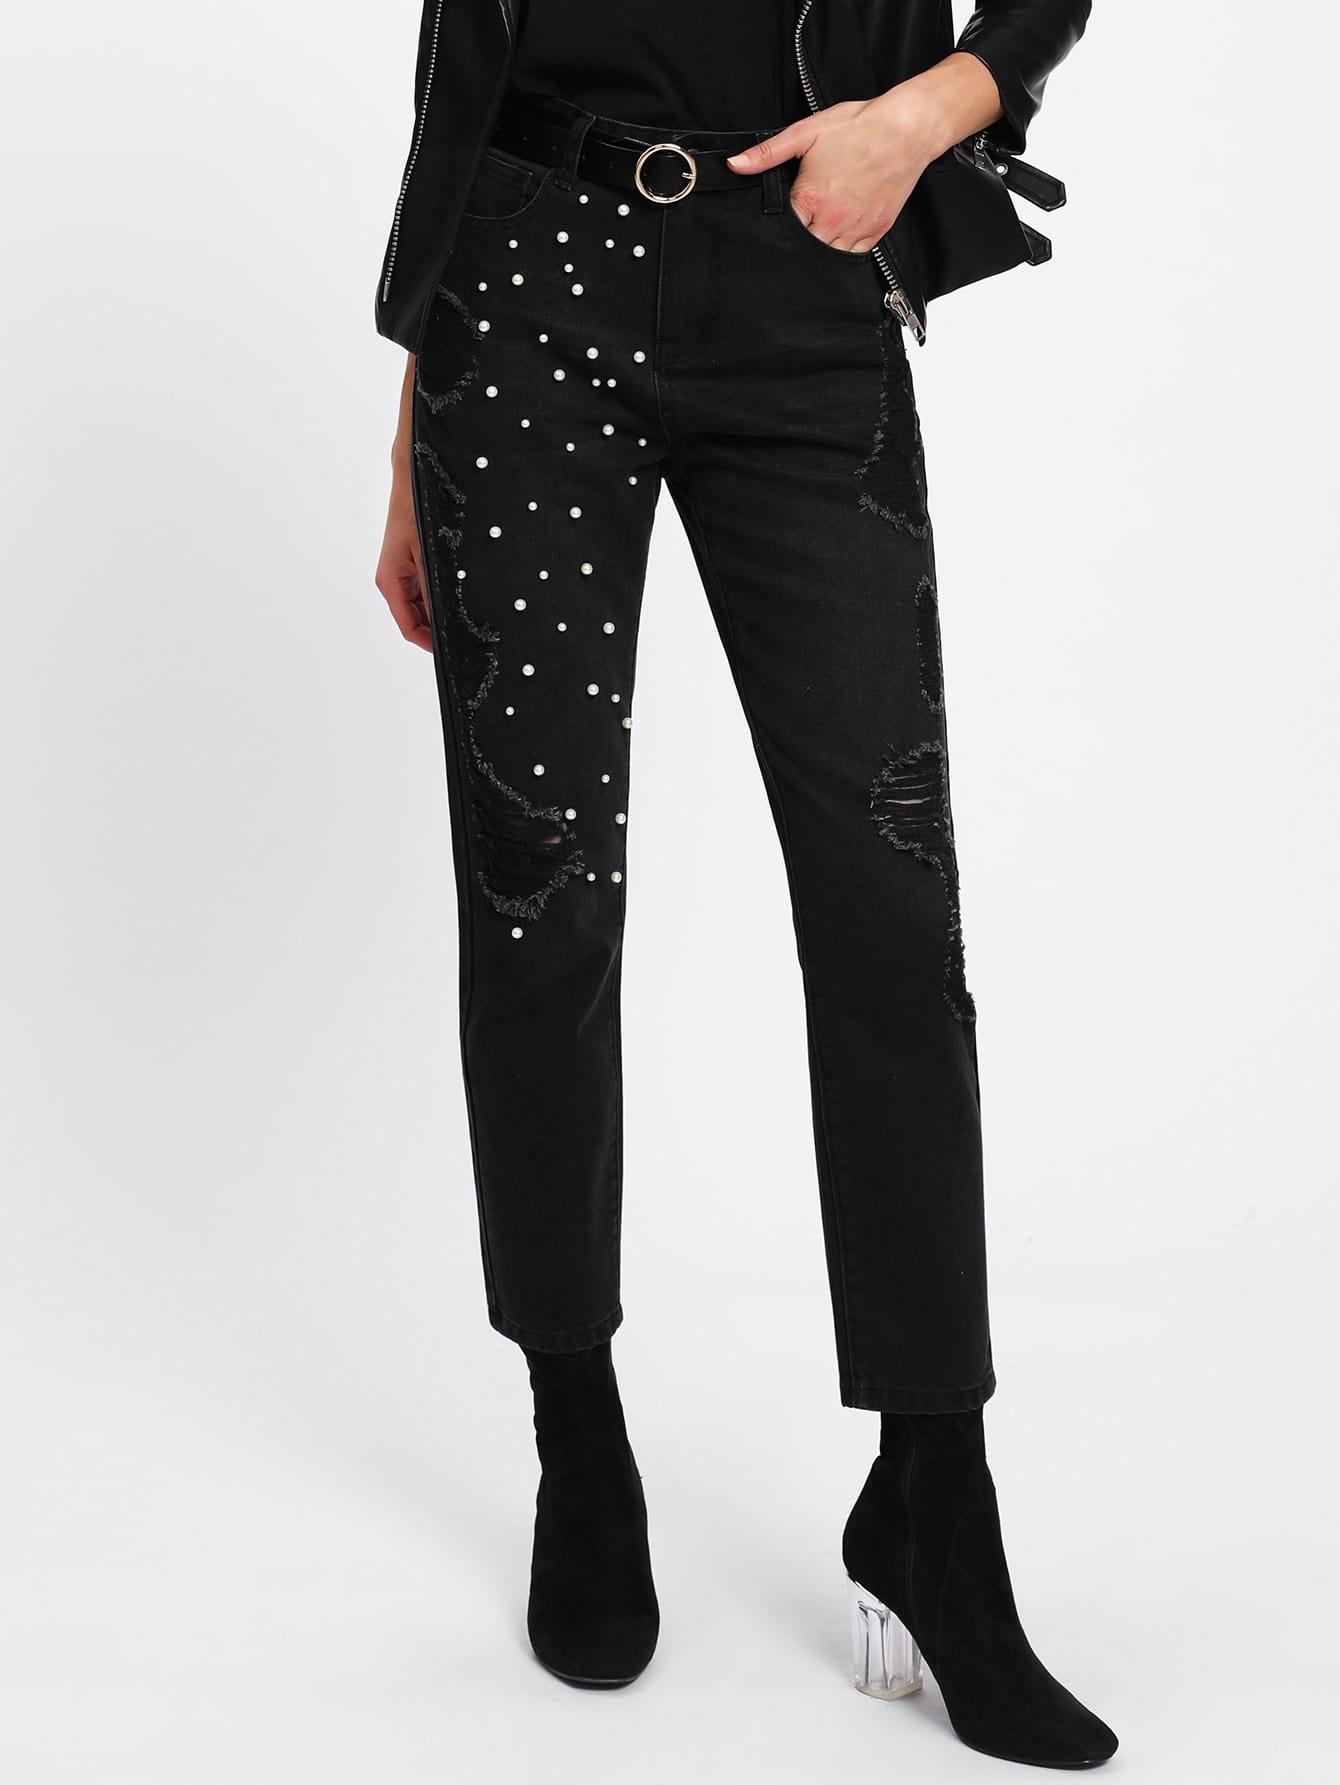 Pearl Beading Shredded Jeans джеймс эшер bhakta ranga rasa india новый взгляд mp3